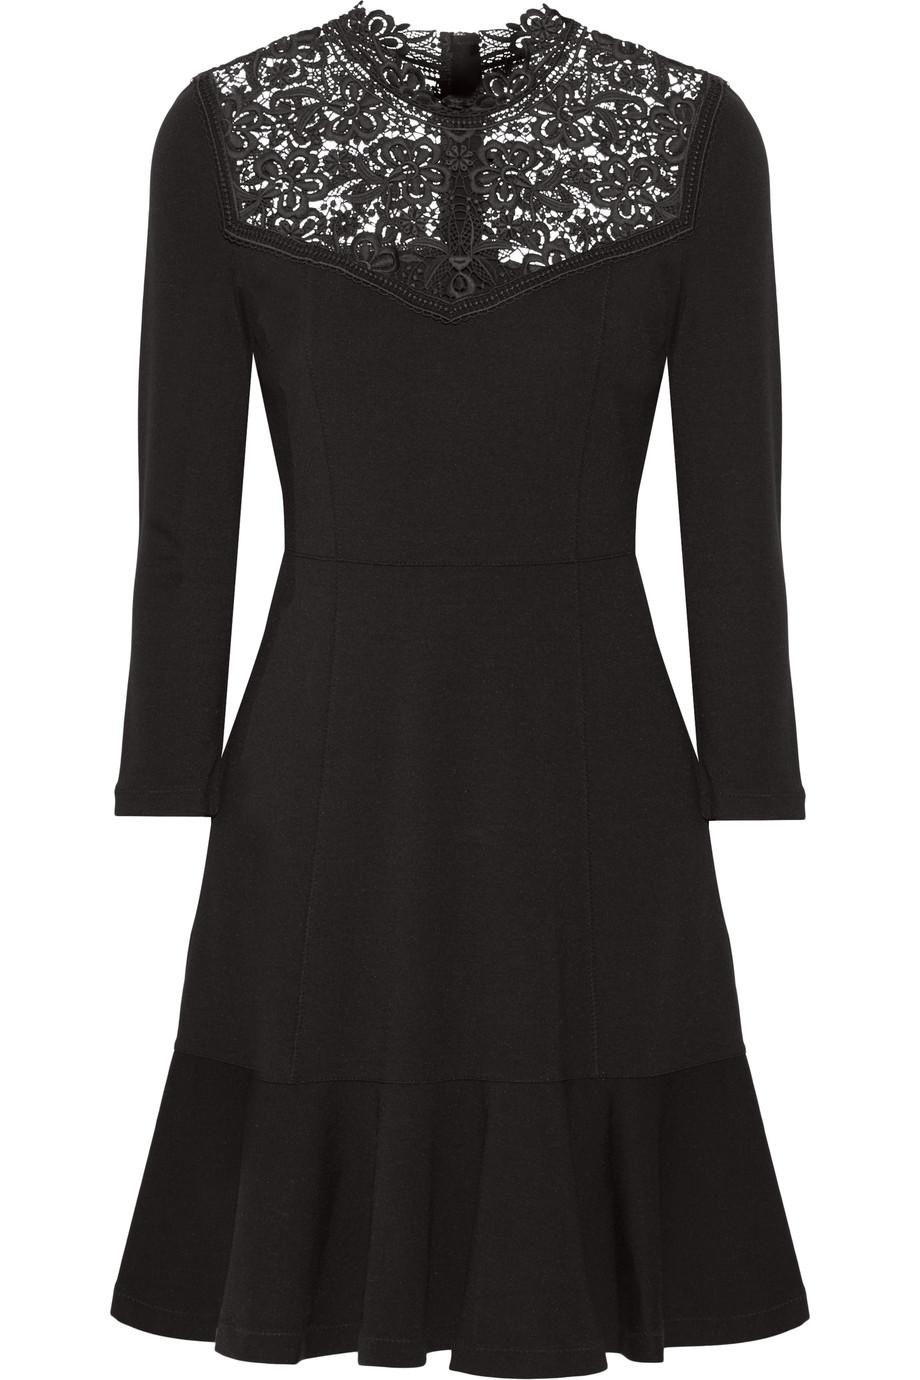 Cozy Erdem Dress | Magnificent Erdem Skirt